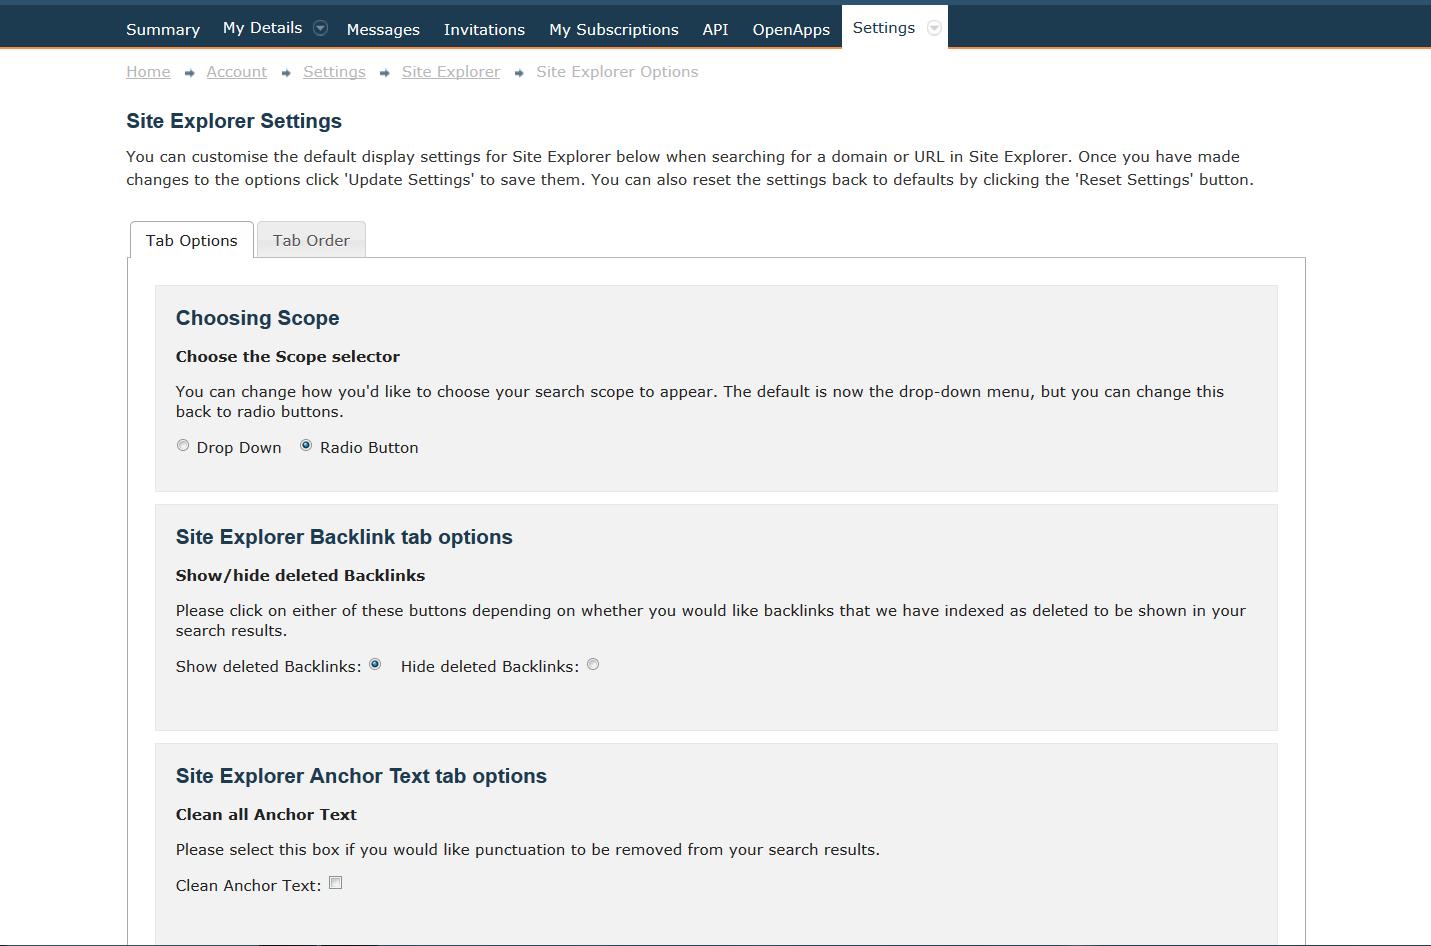 Image 3: Site Explorer Settings